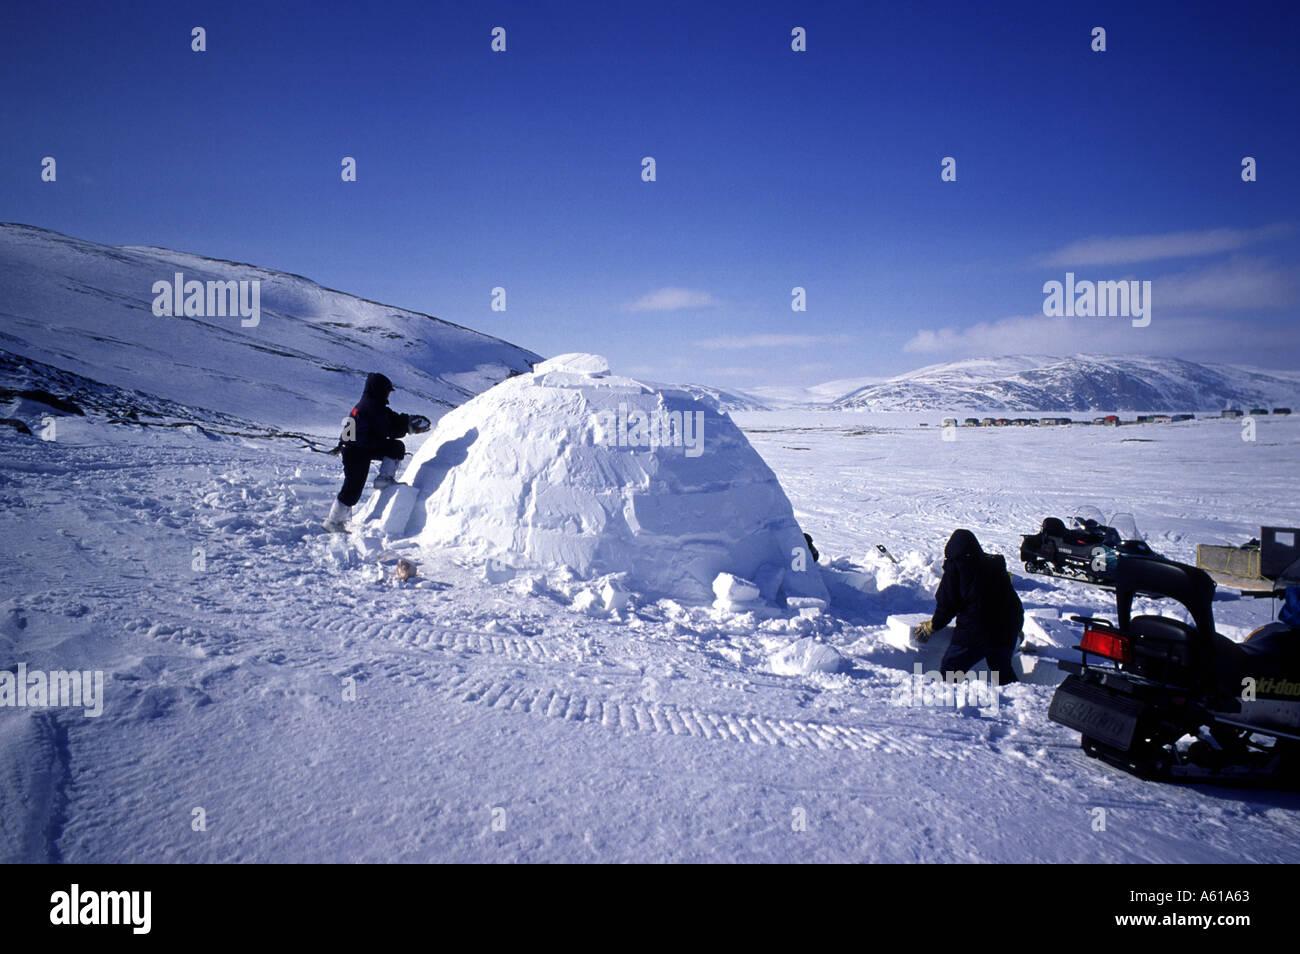 Inuit building an igloo - Stock Image